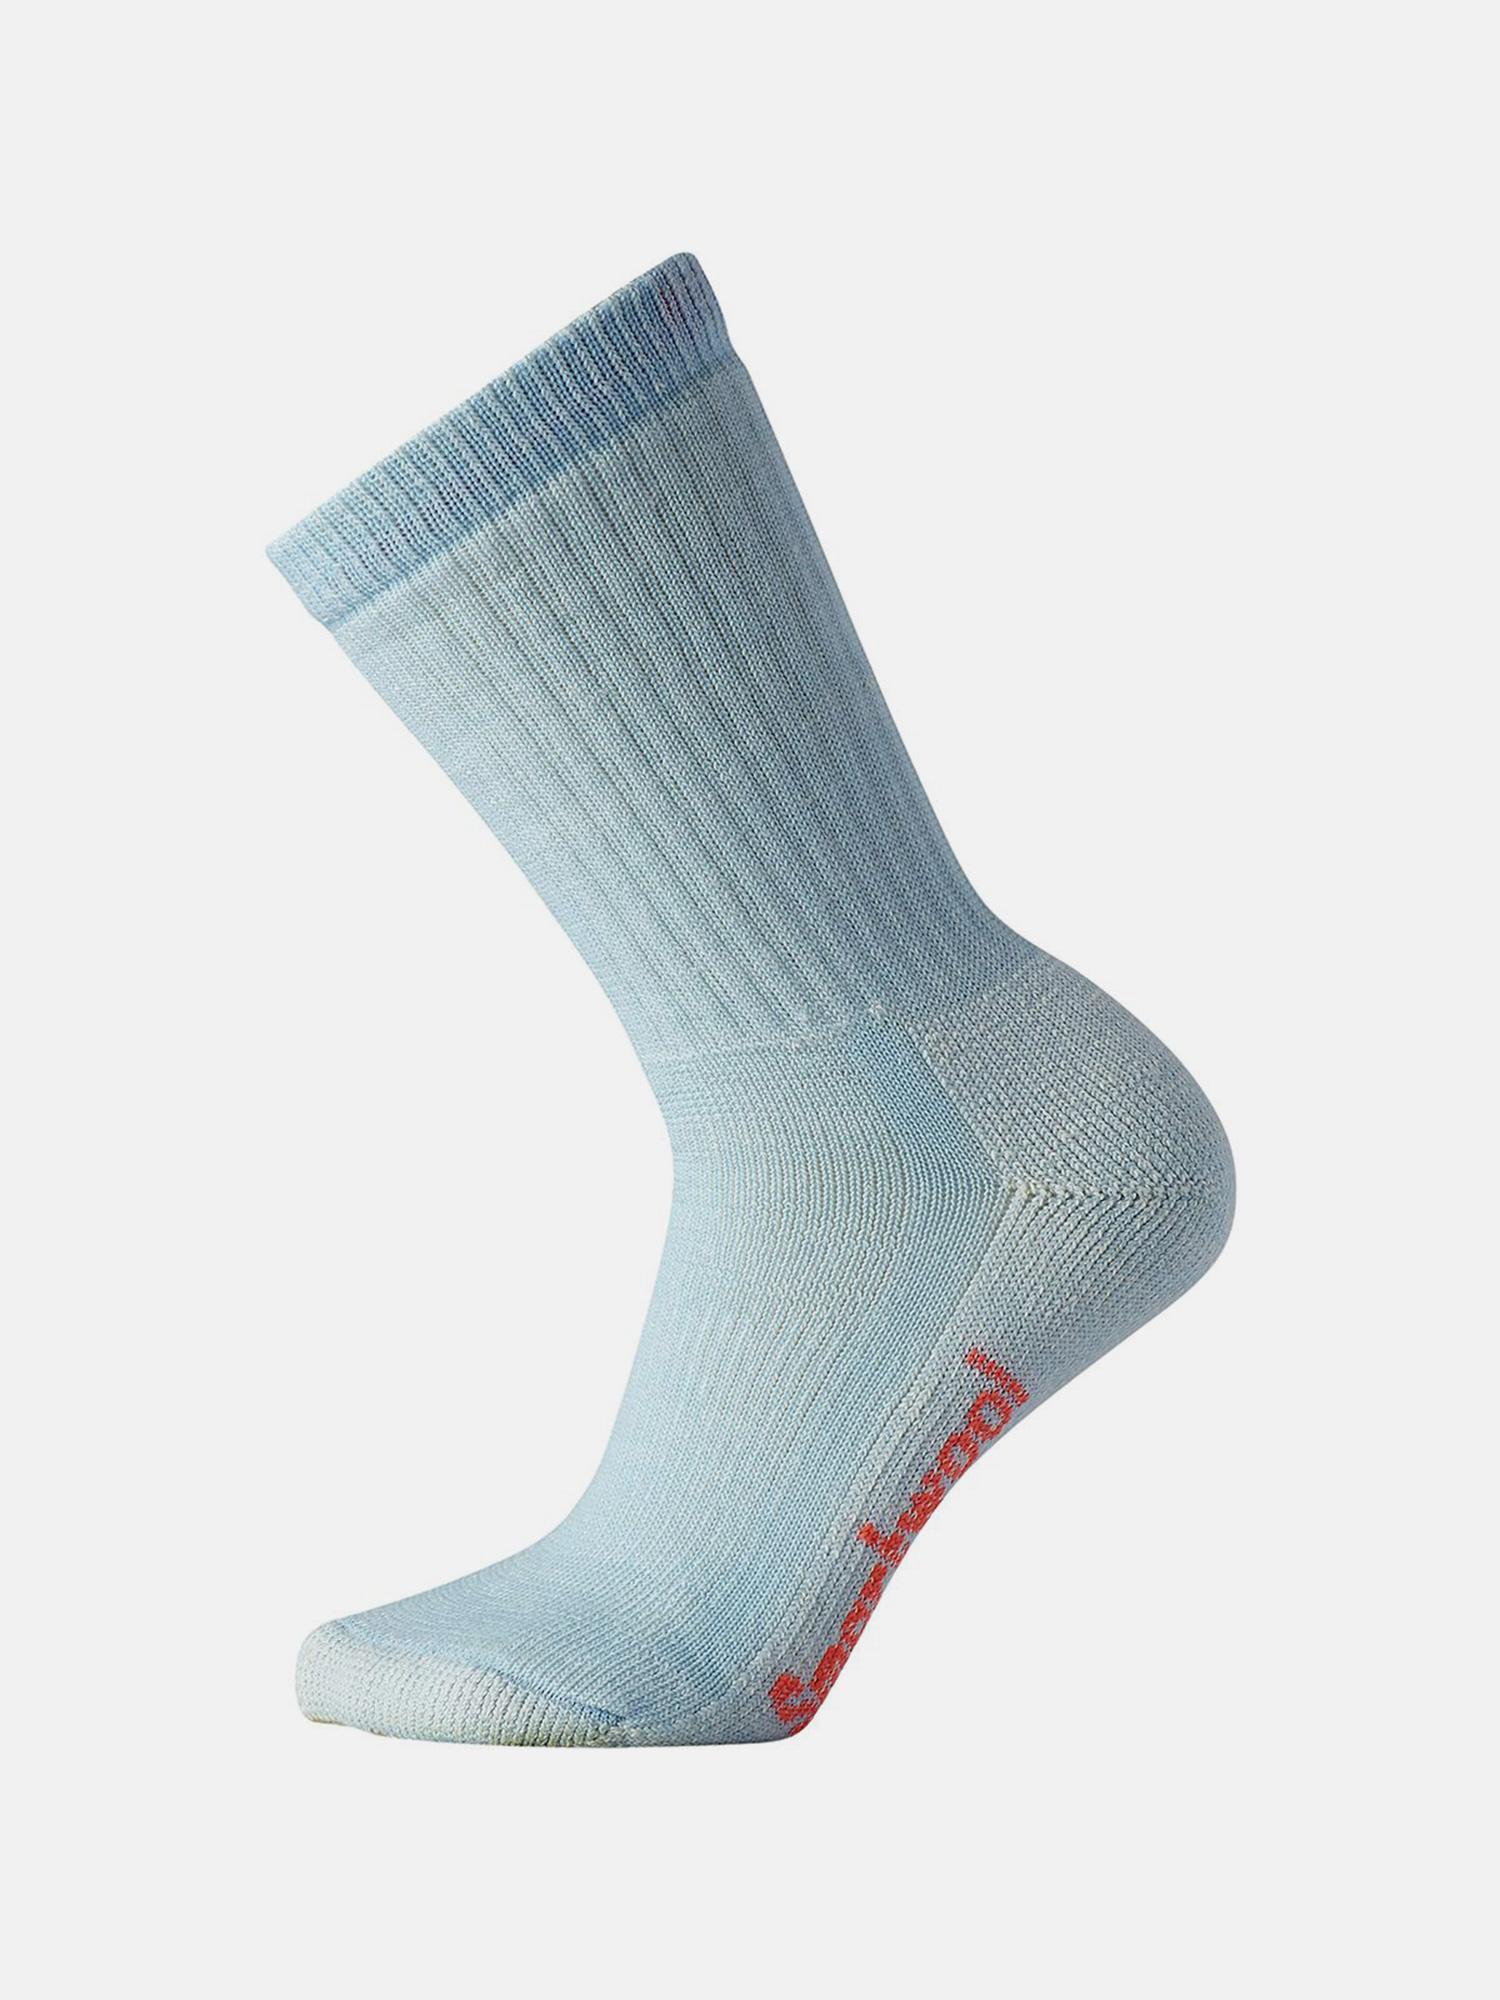 Smartwool Hiking Socks - $14.25